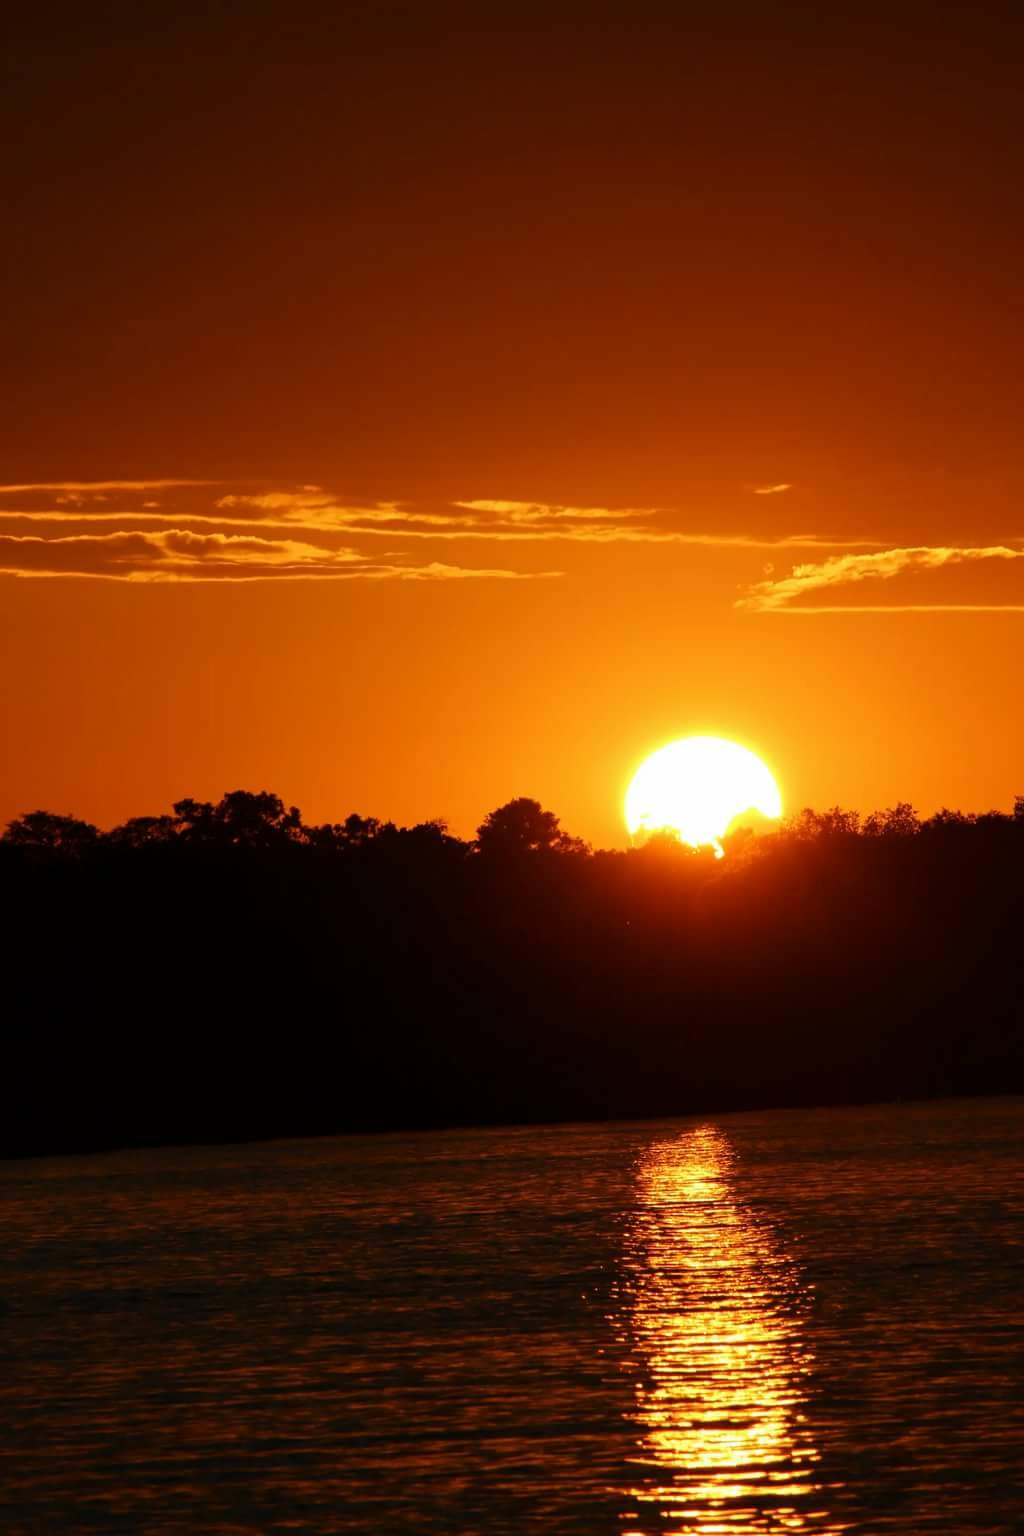 Красивые картинки заката или рассвета